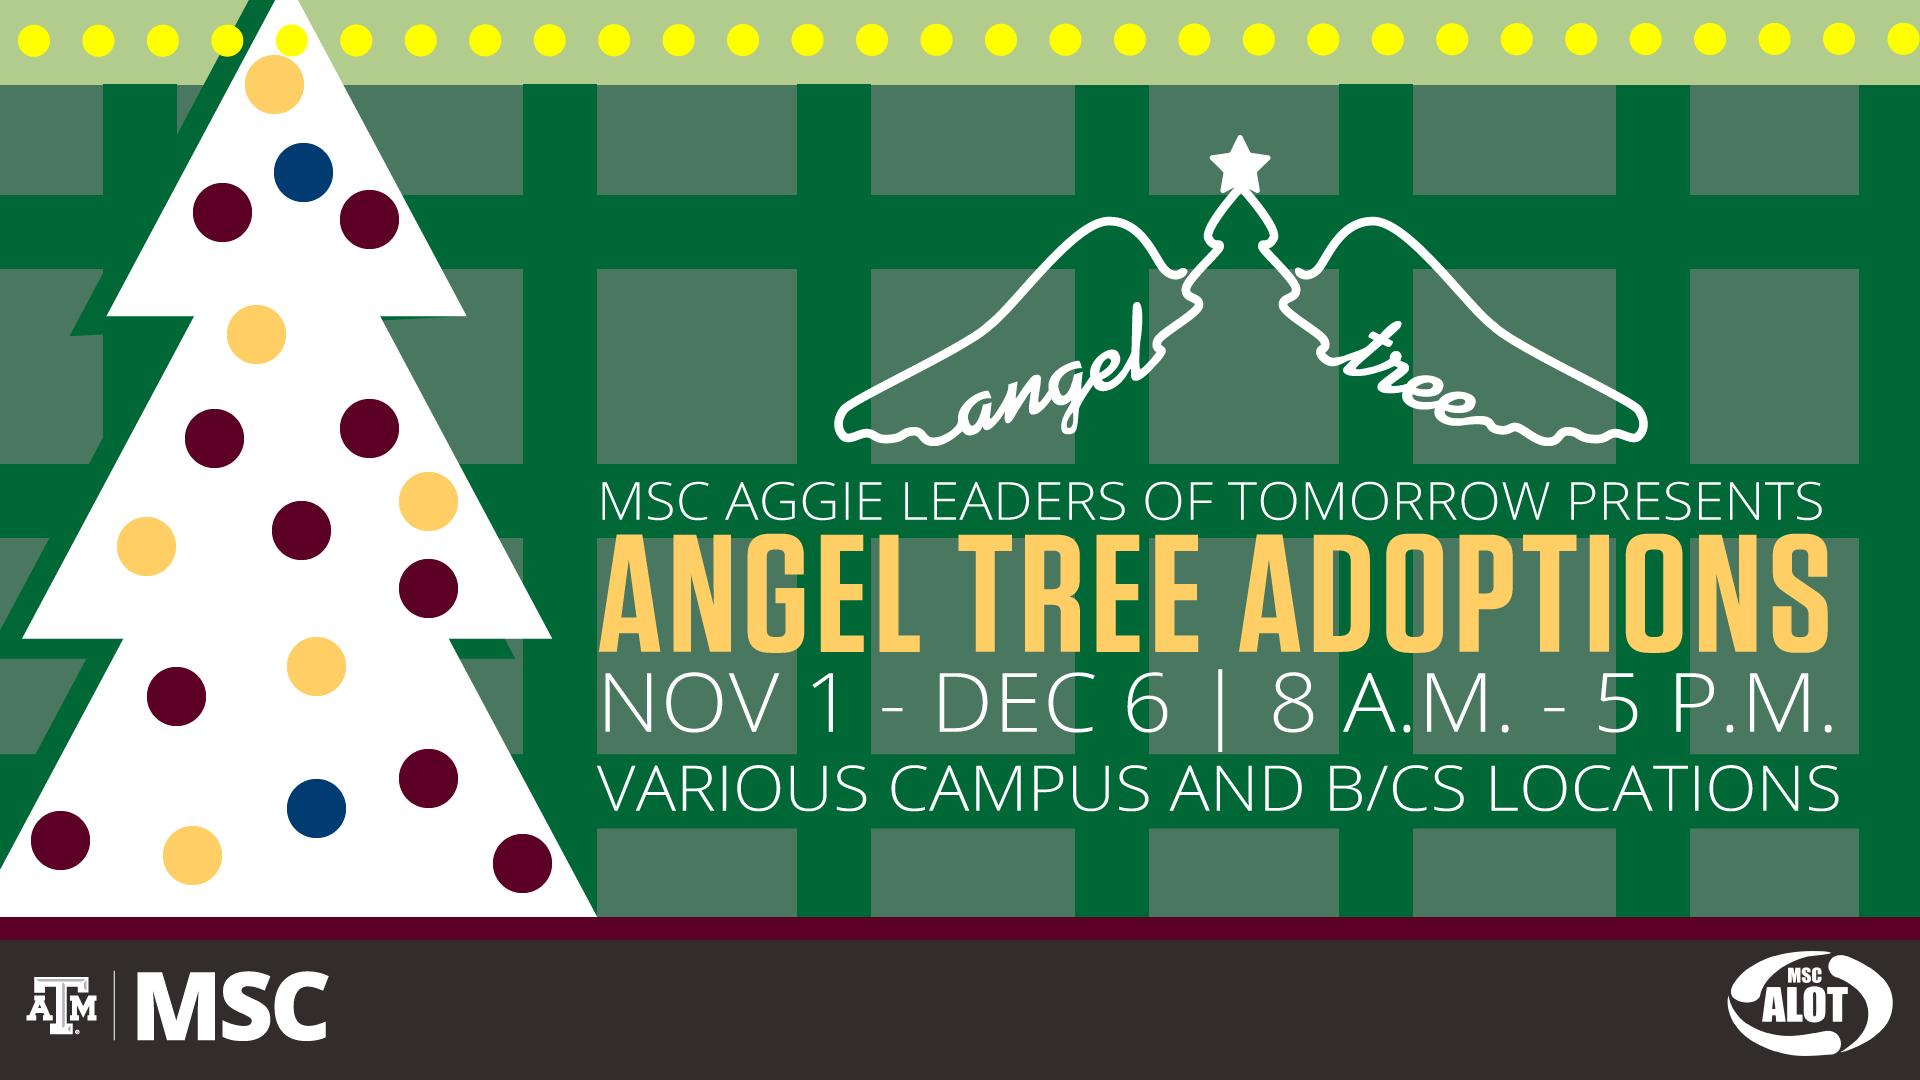 Angel Tree Adoptions